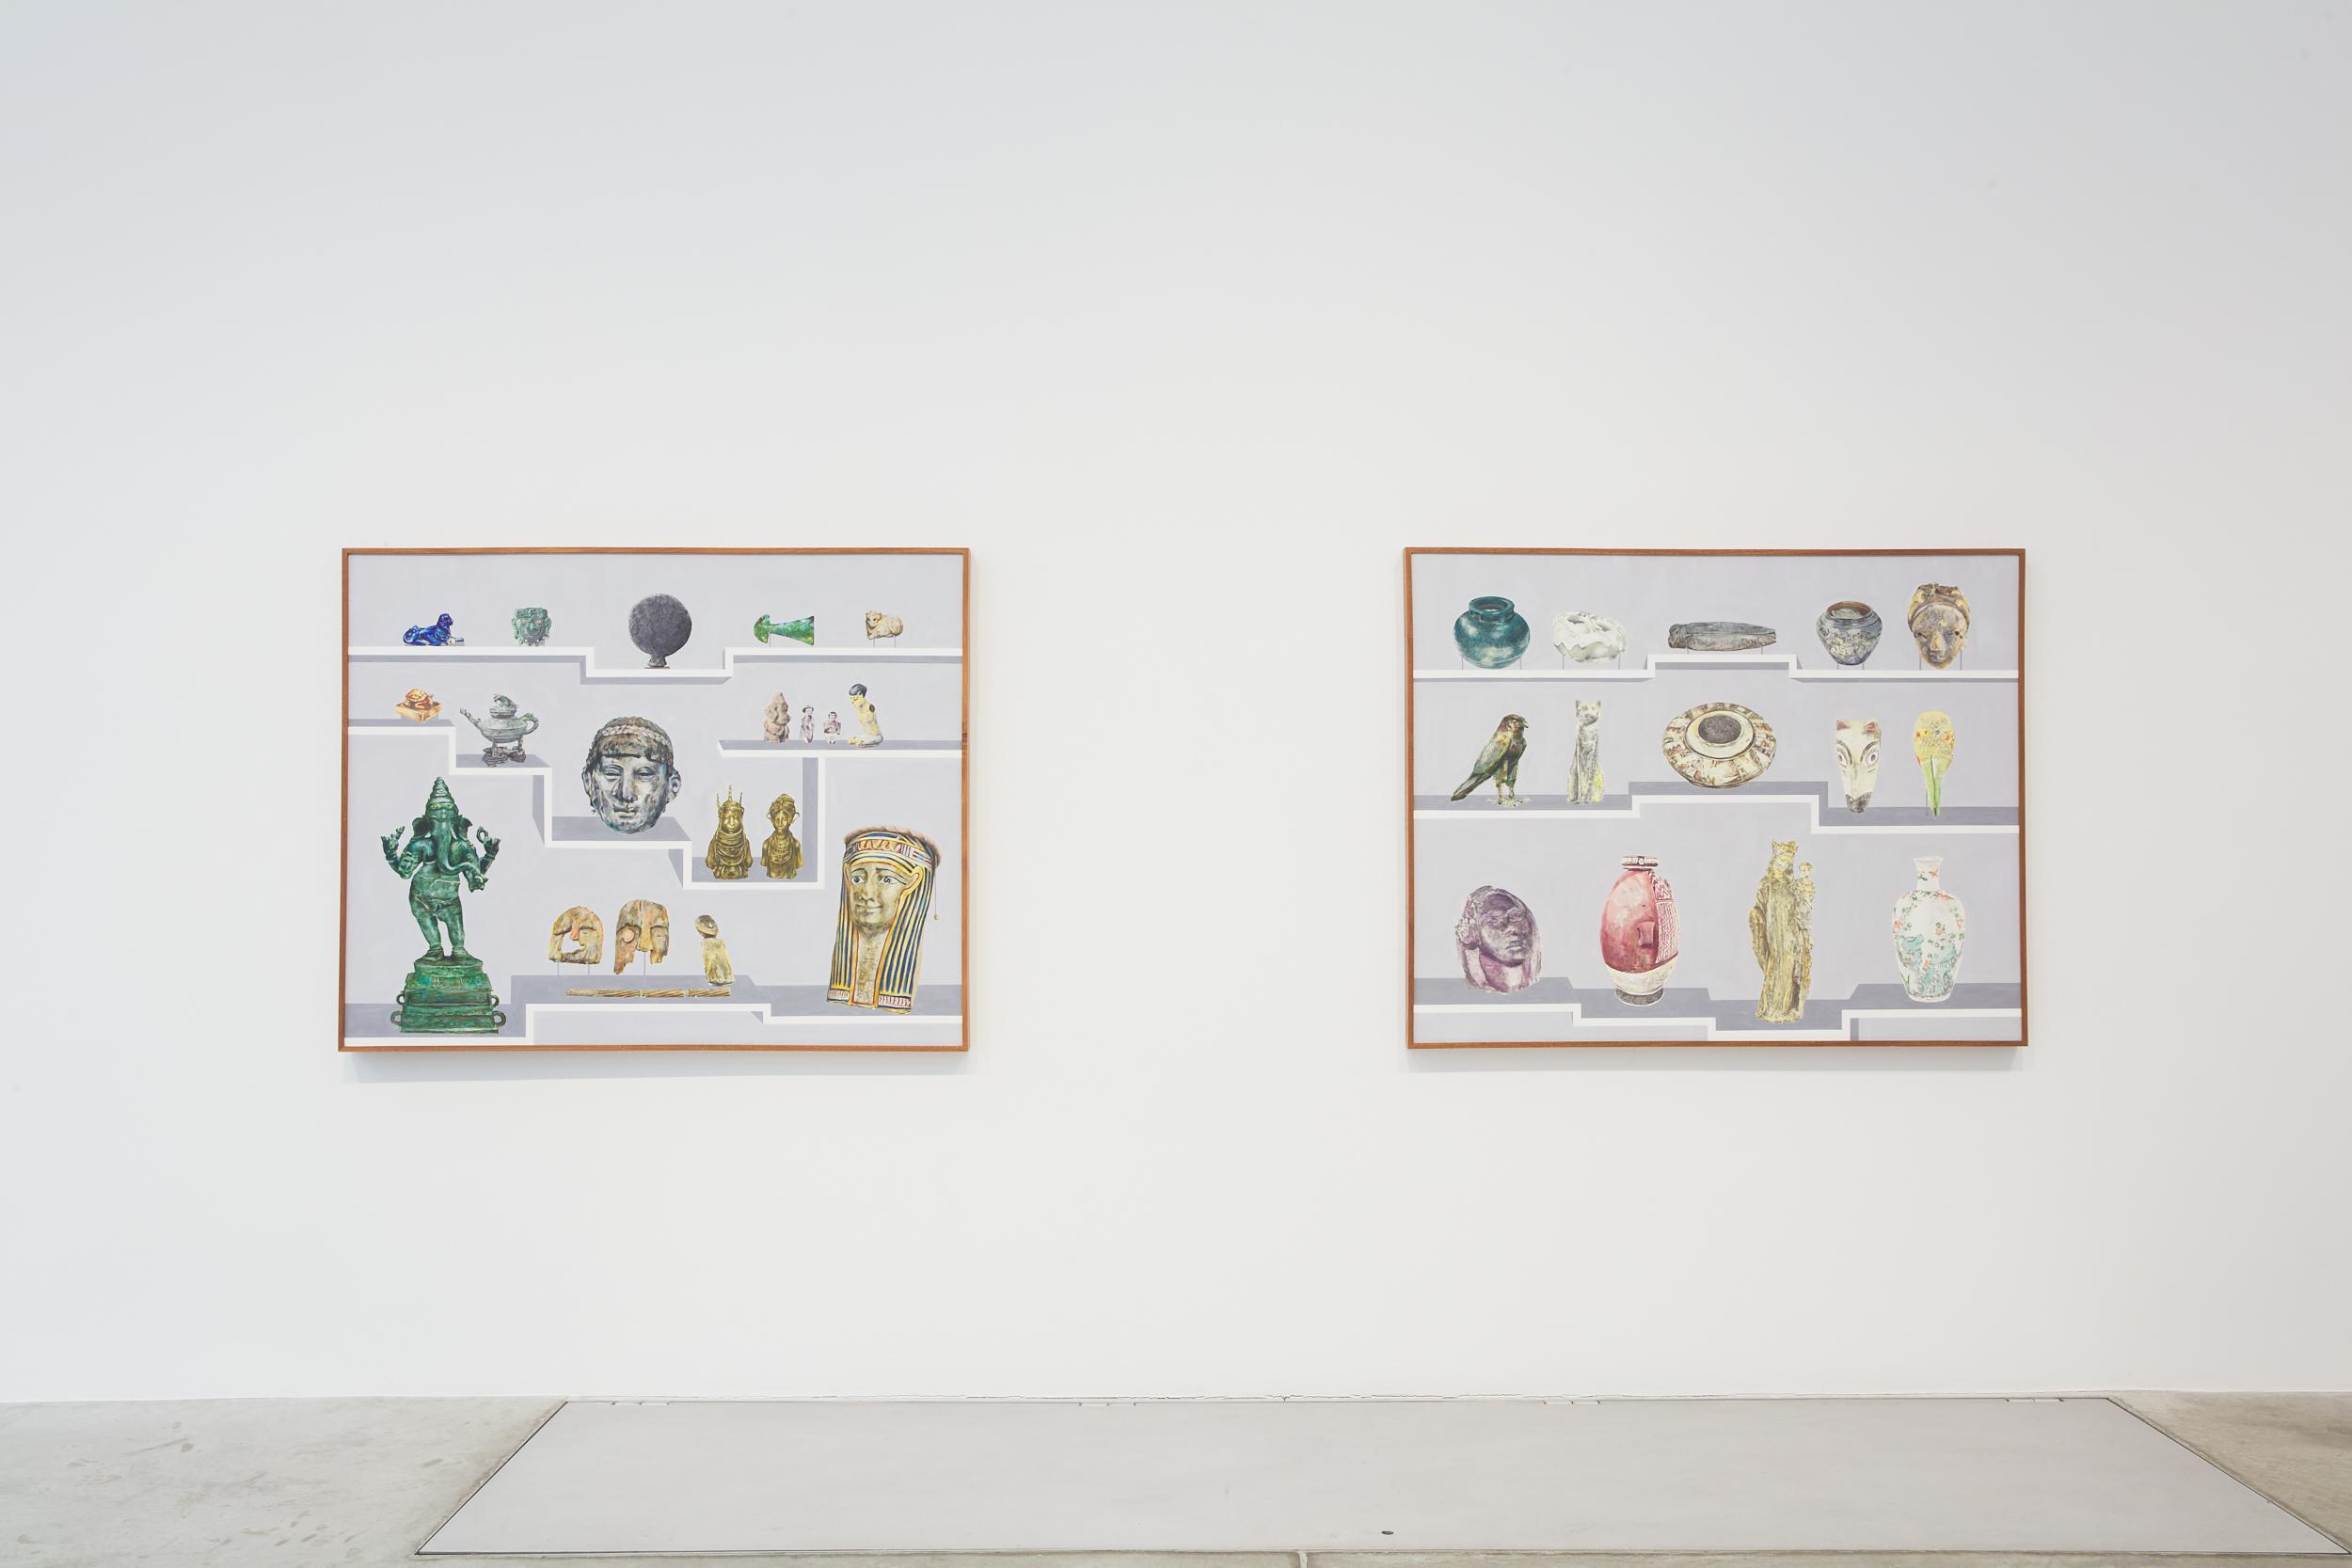 """Springweather and people, installation view, Bortolami, New York, 2021. Image courtesy Bortolami, New York. Photography by Kristian Laudrup."""